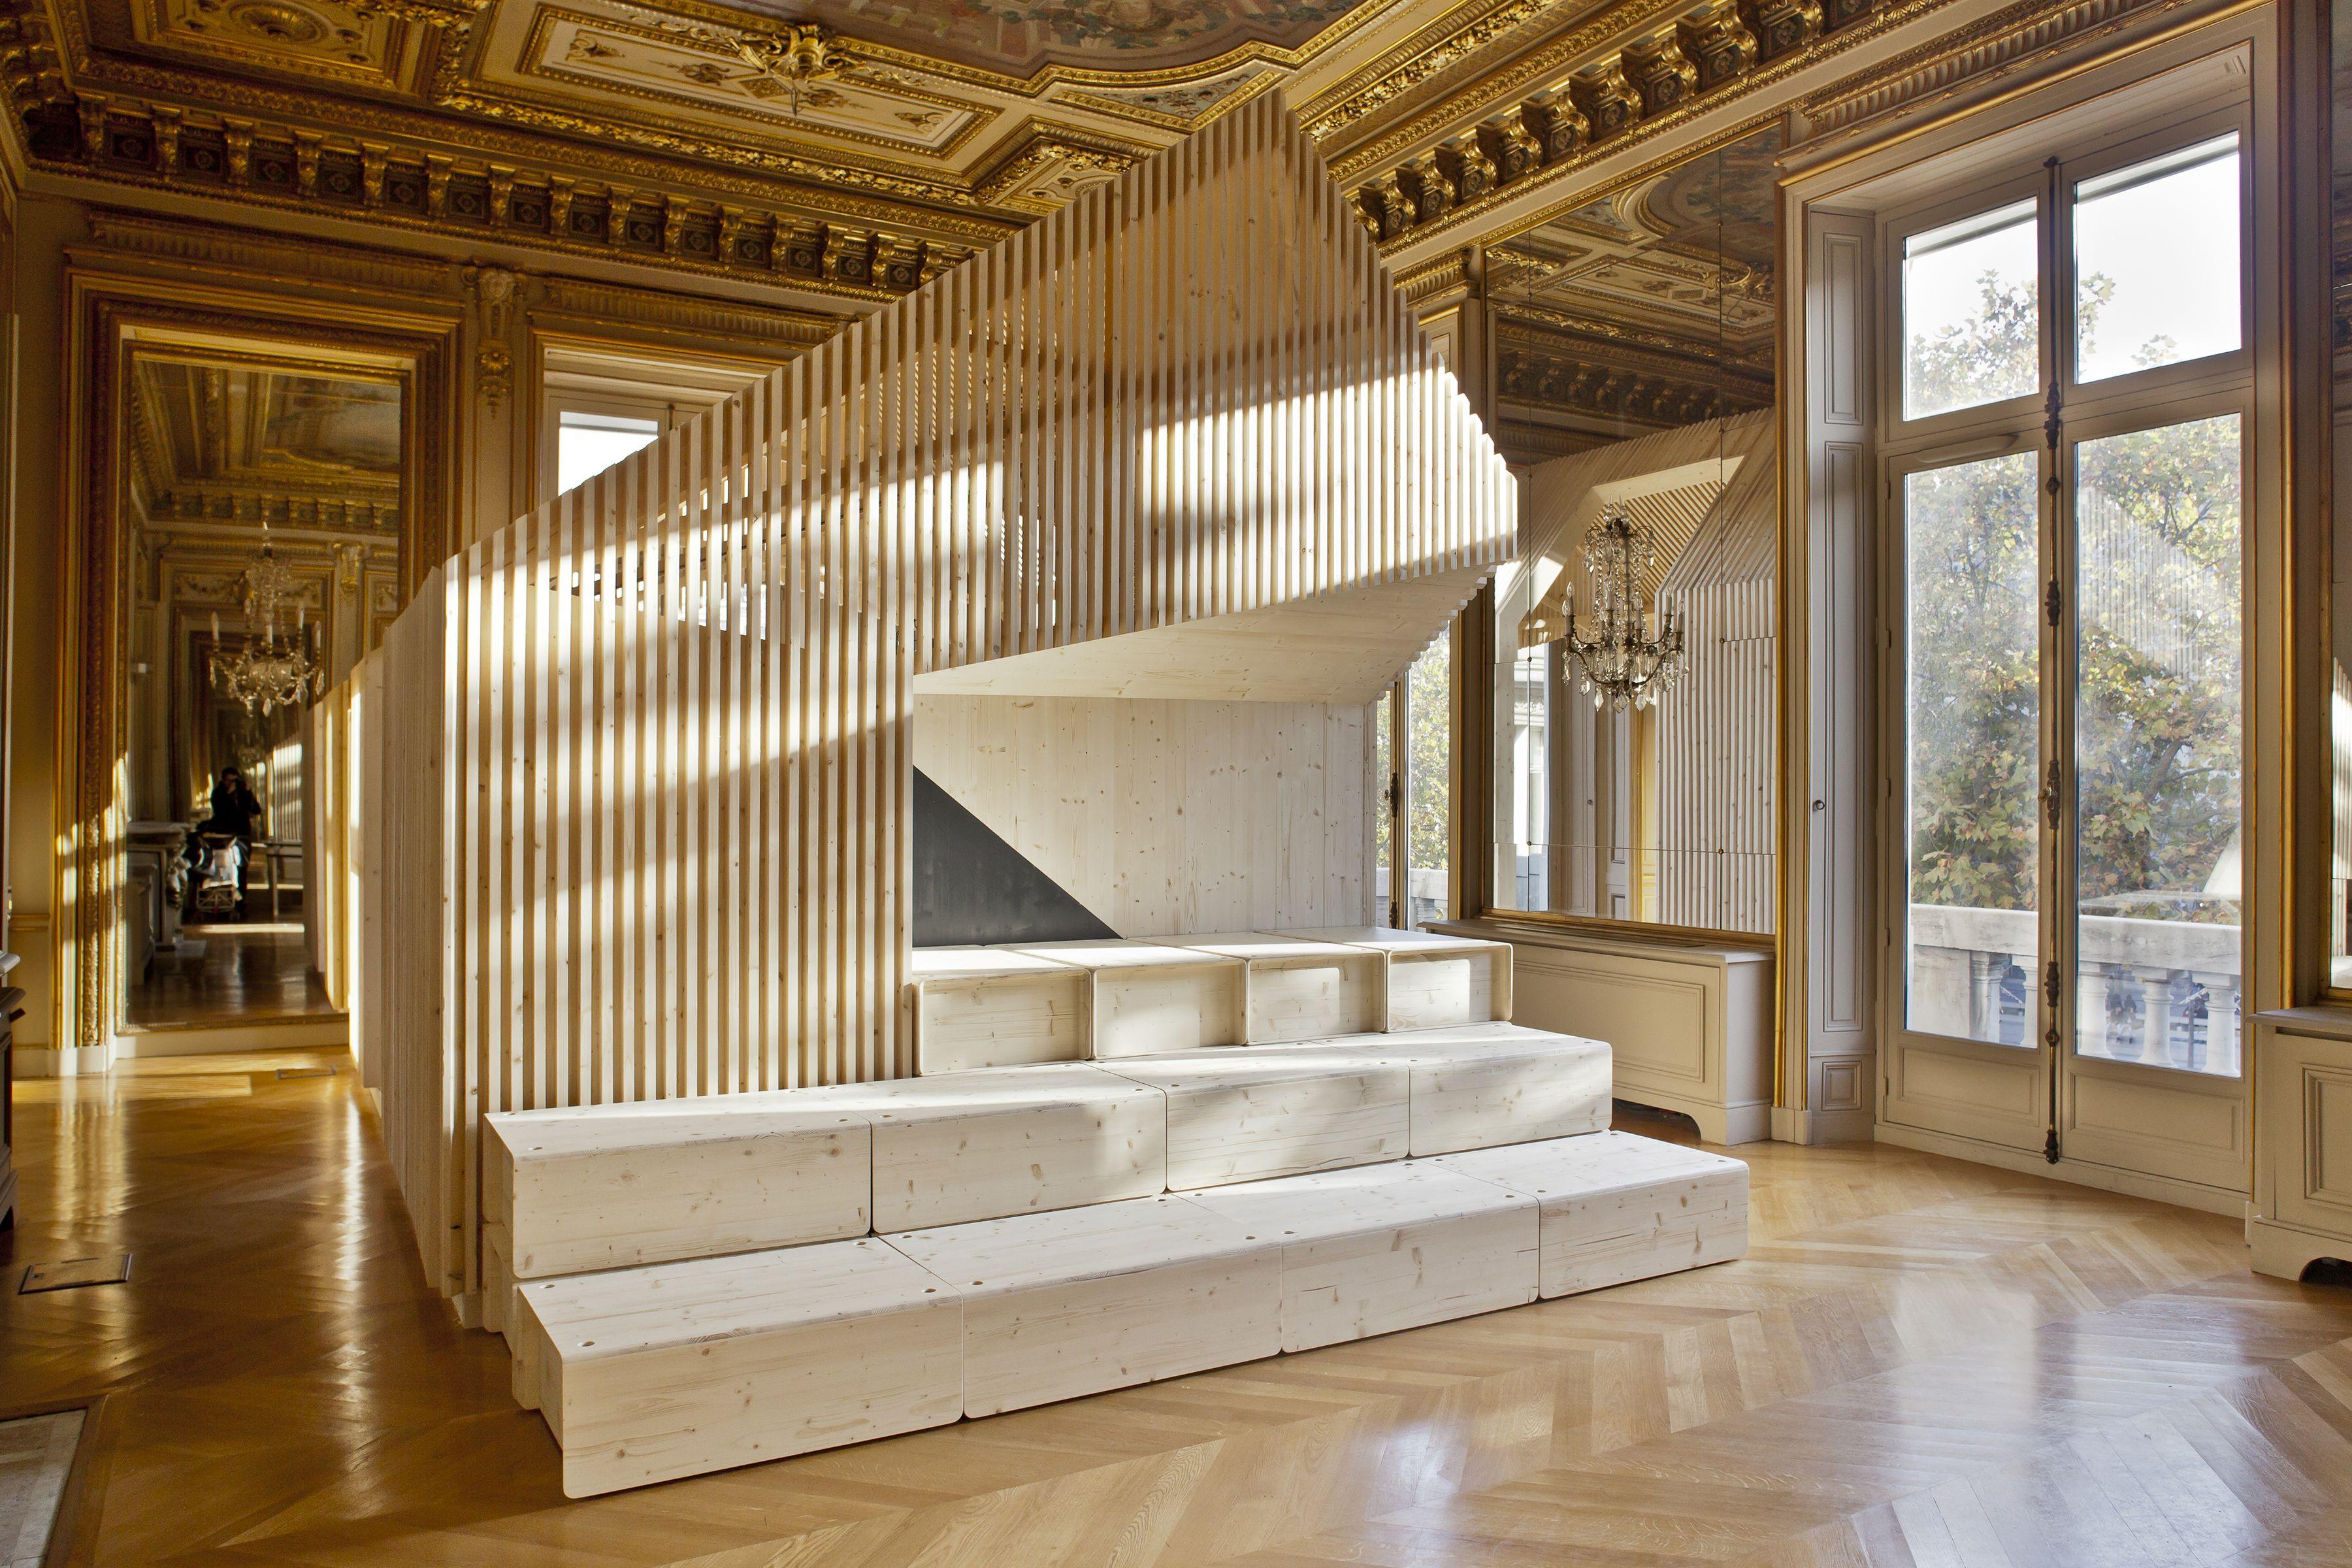 Ekimetrics, Paris  #HospitalityDesign #HospitalityDesignMagazine #hdmag #design #inspiration #Paris